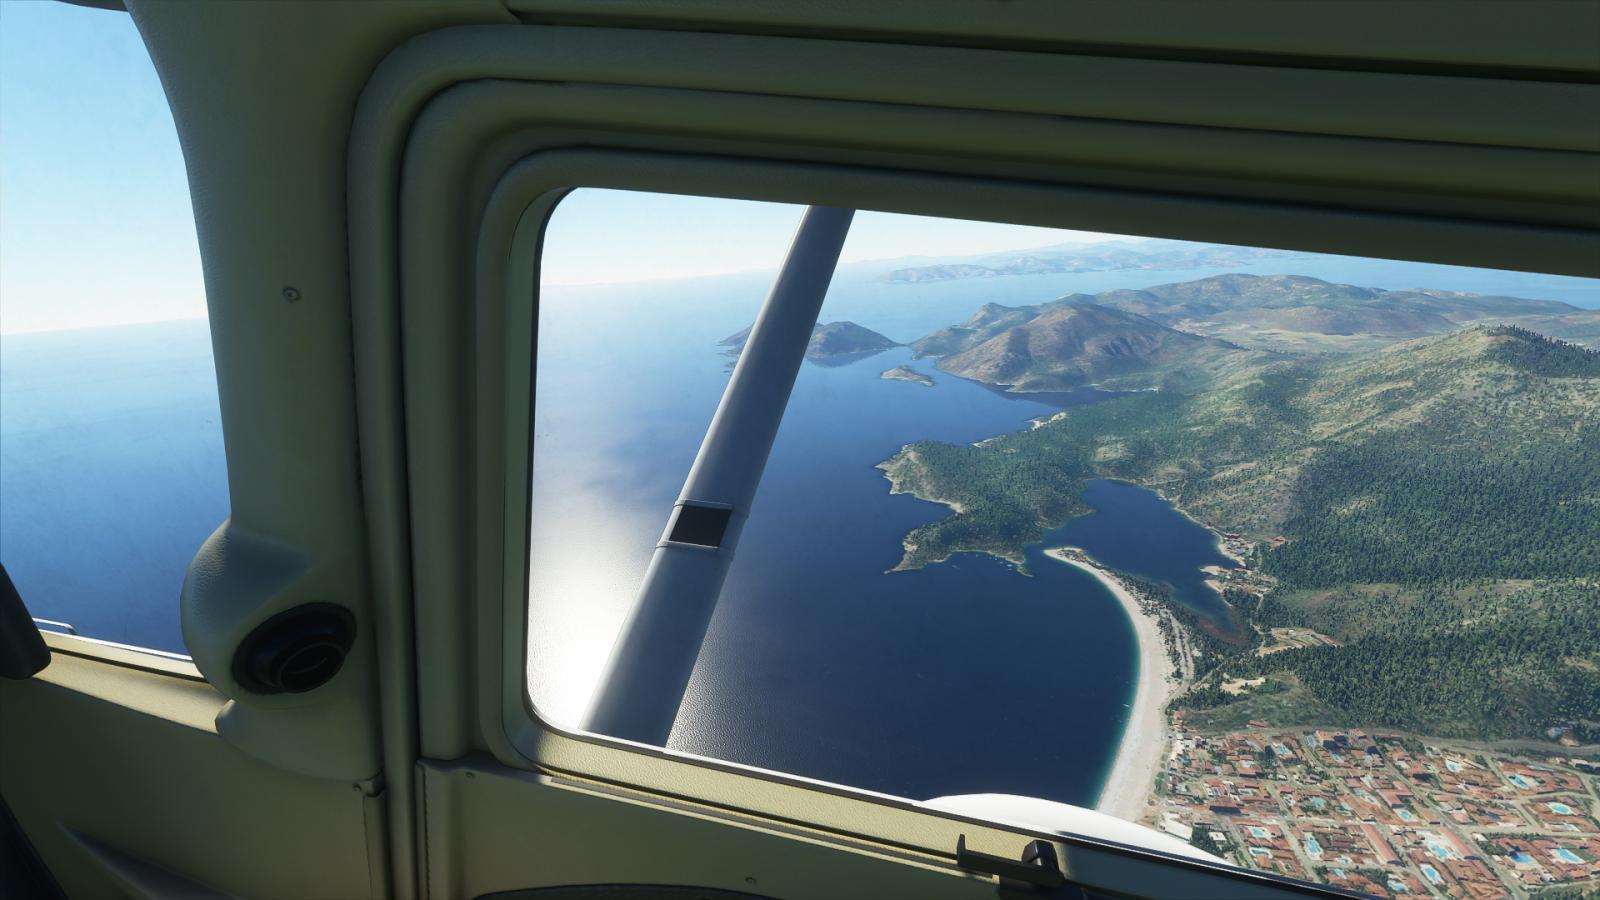 İsim:  Microsoft Flight Simulator Screenshot 2020.08.27 - 19.55.59.60.jpg Görüntüleme: 167 Büyüklük:  141.2 KB (Kilobyte)